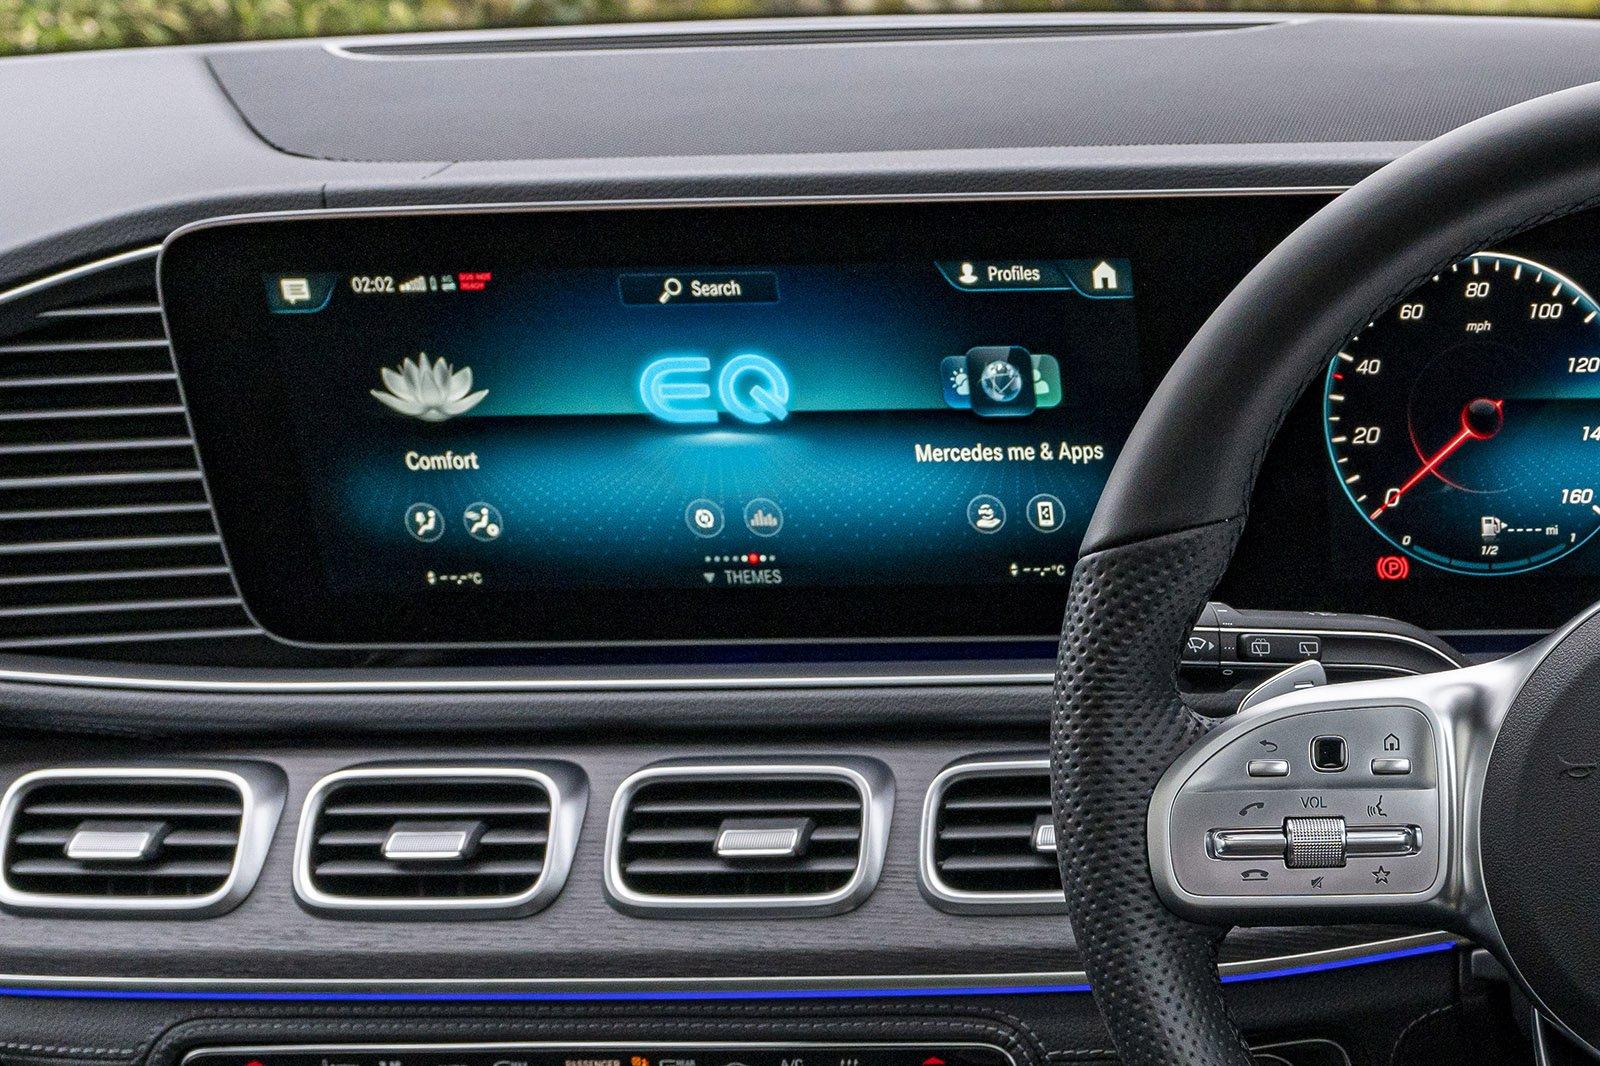 Mercedes GLE 2021 infotainment